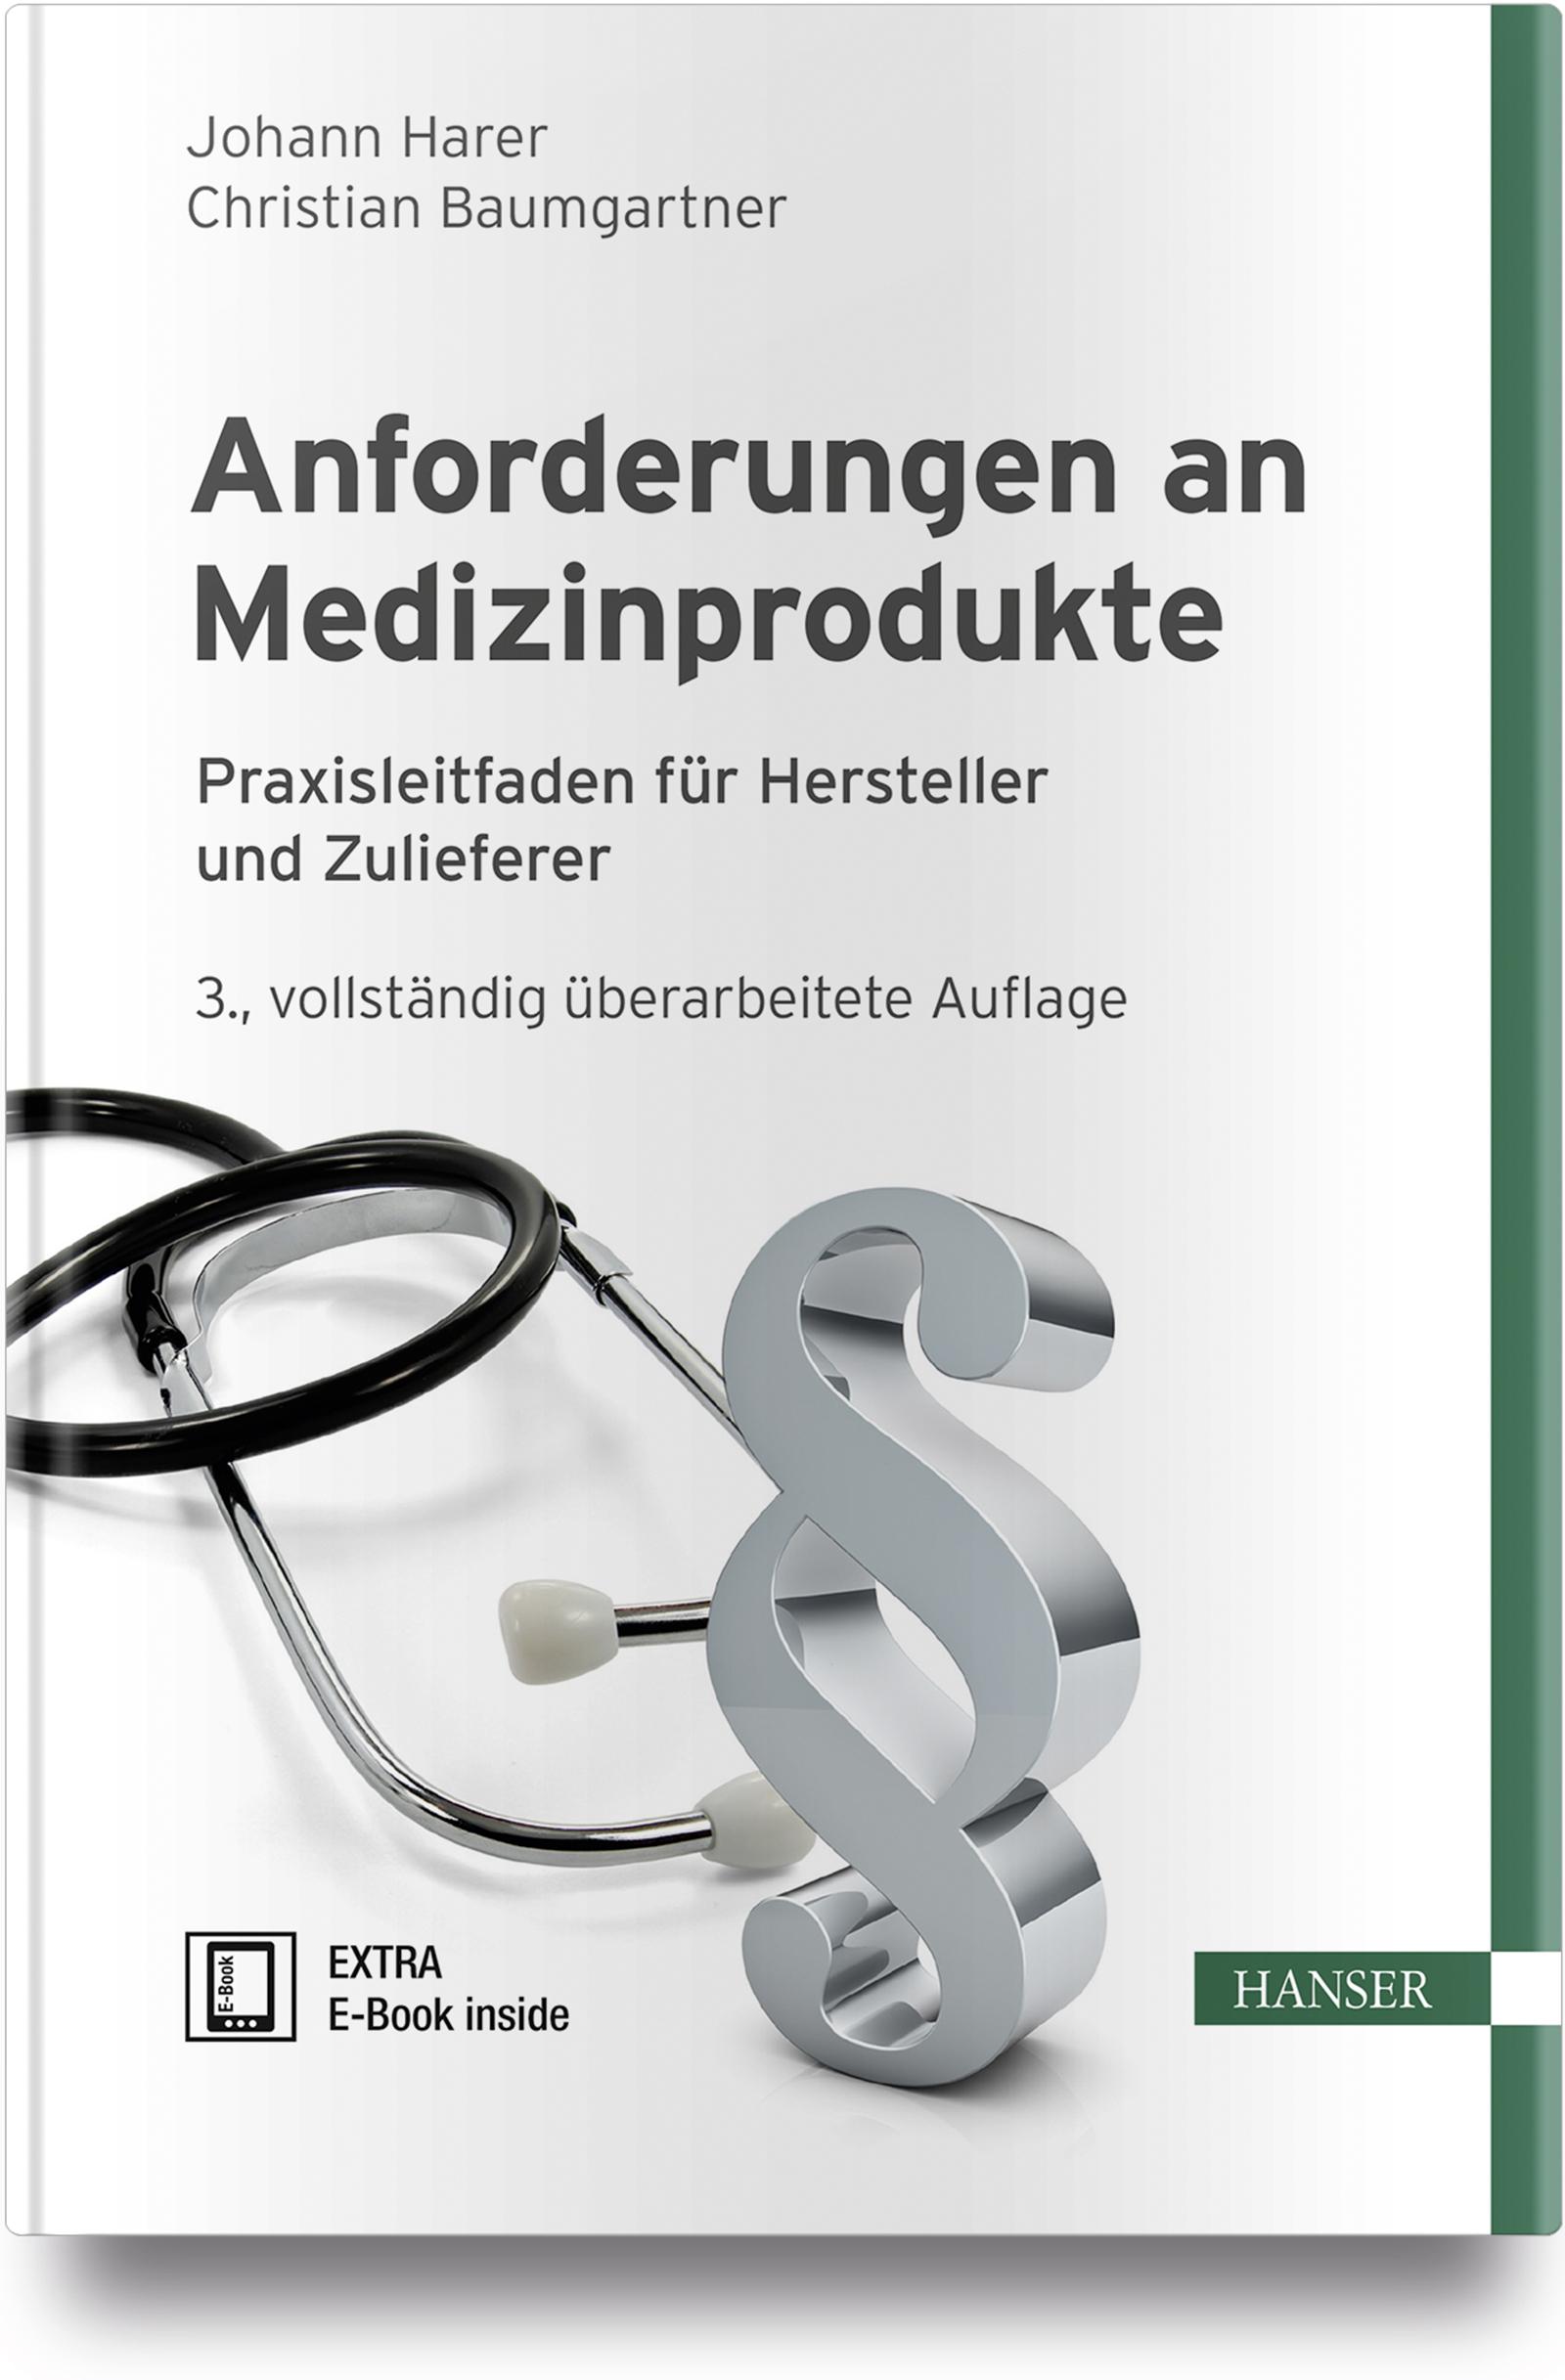 Harer, Baumgartner, Anforderungen an Medizinprodukte, 978-3-446-45377-7